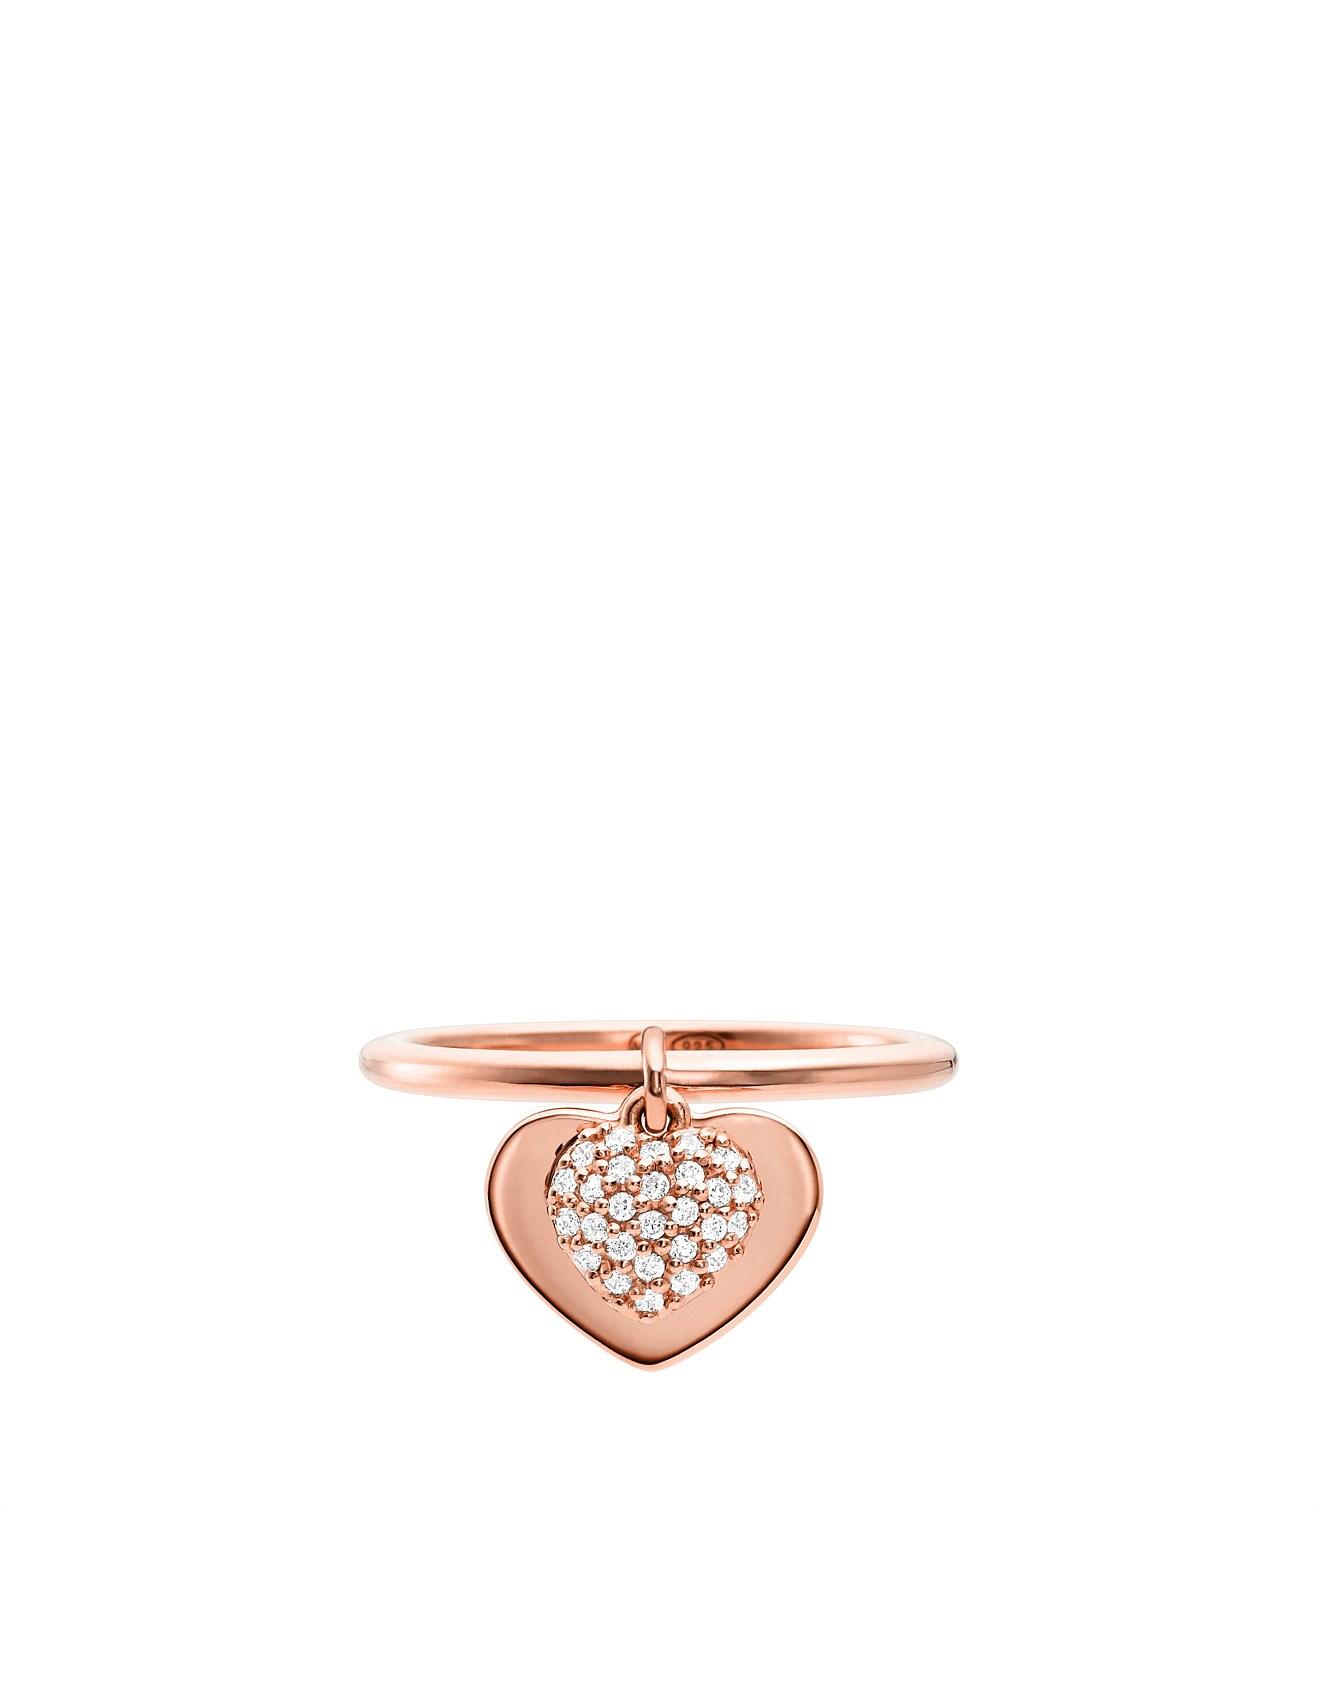 69bf4e62eec3 Michael Kors Premium Rose Gold Ring